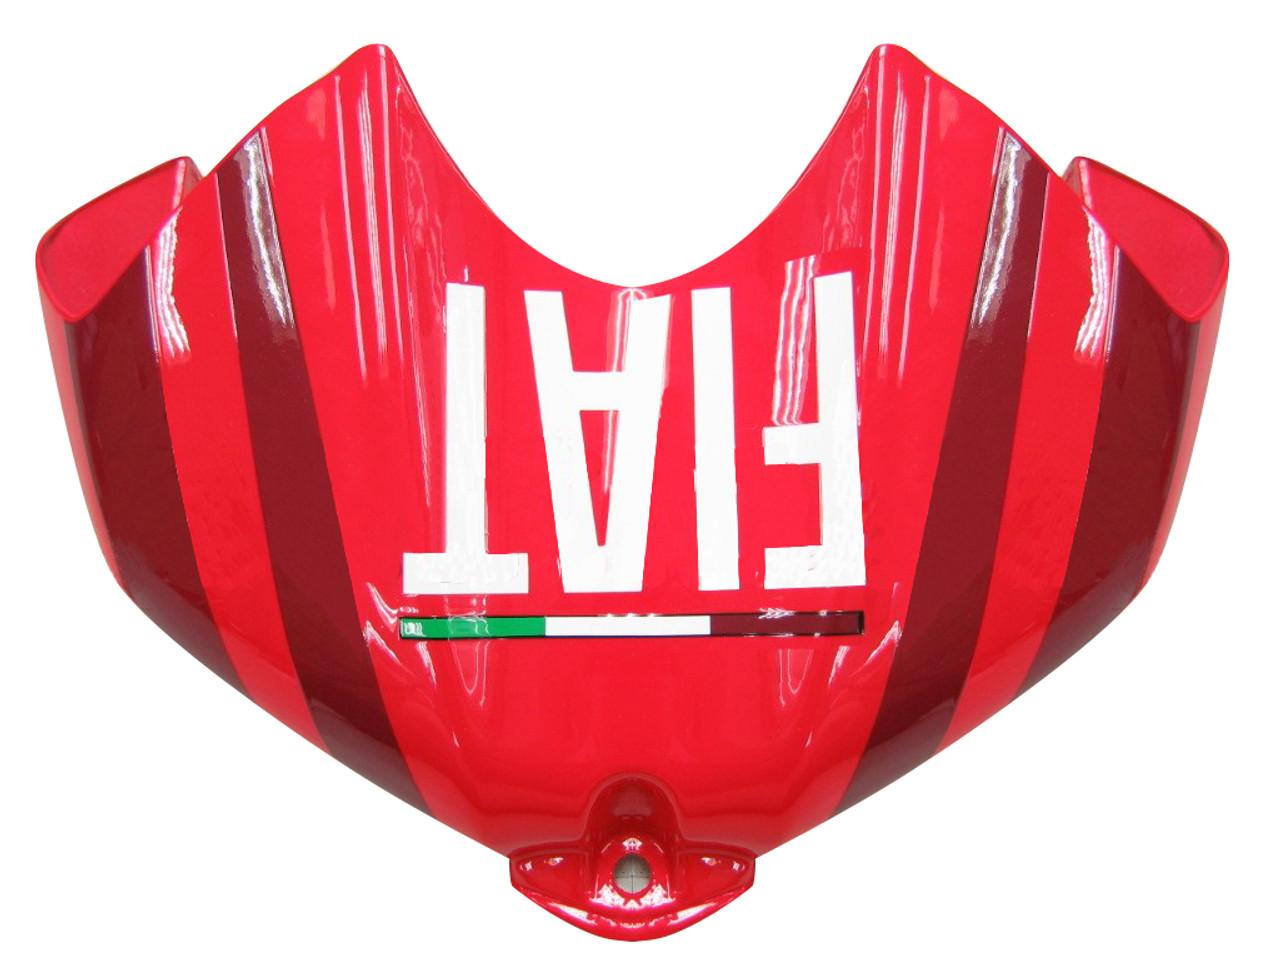 Fairings Yamaha YZF-R6 Red White Star FIAT R6 Racing (2006-2007)